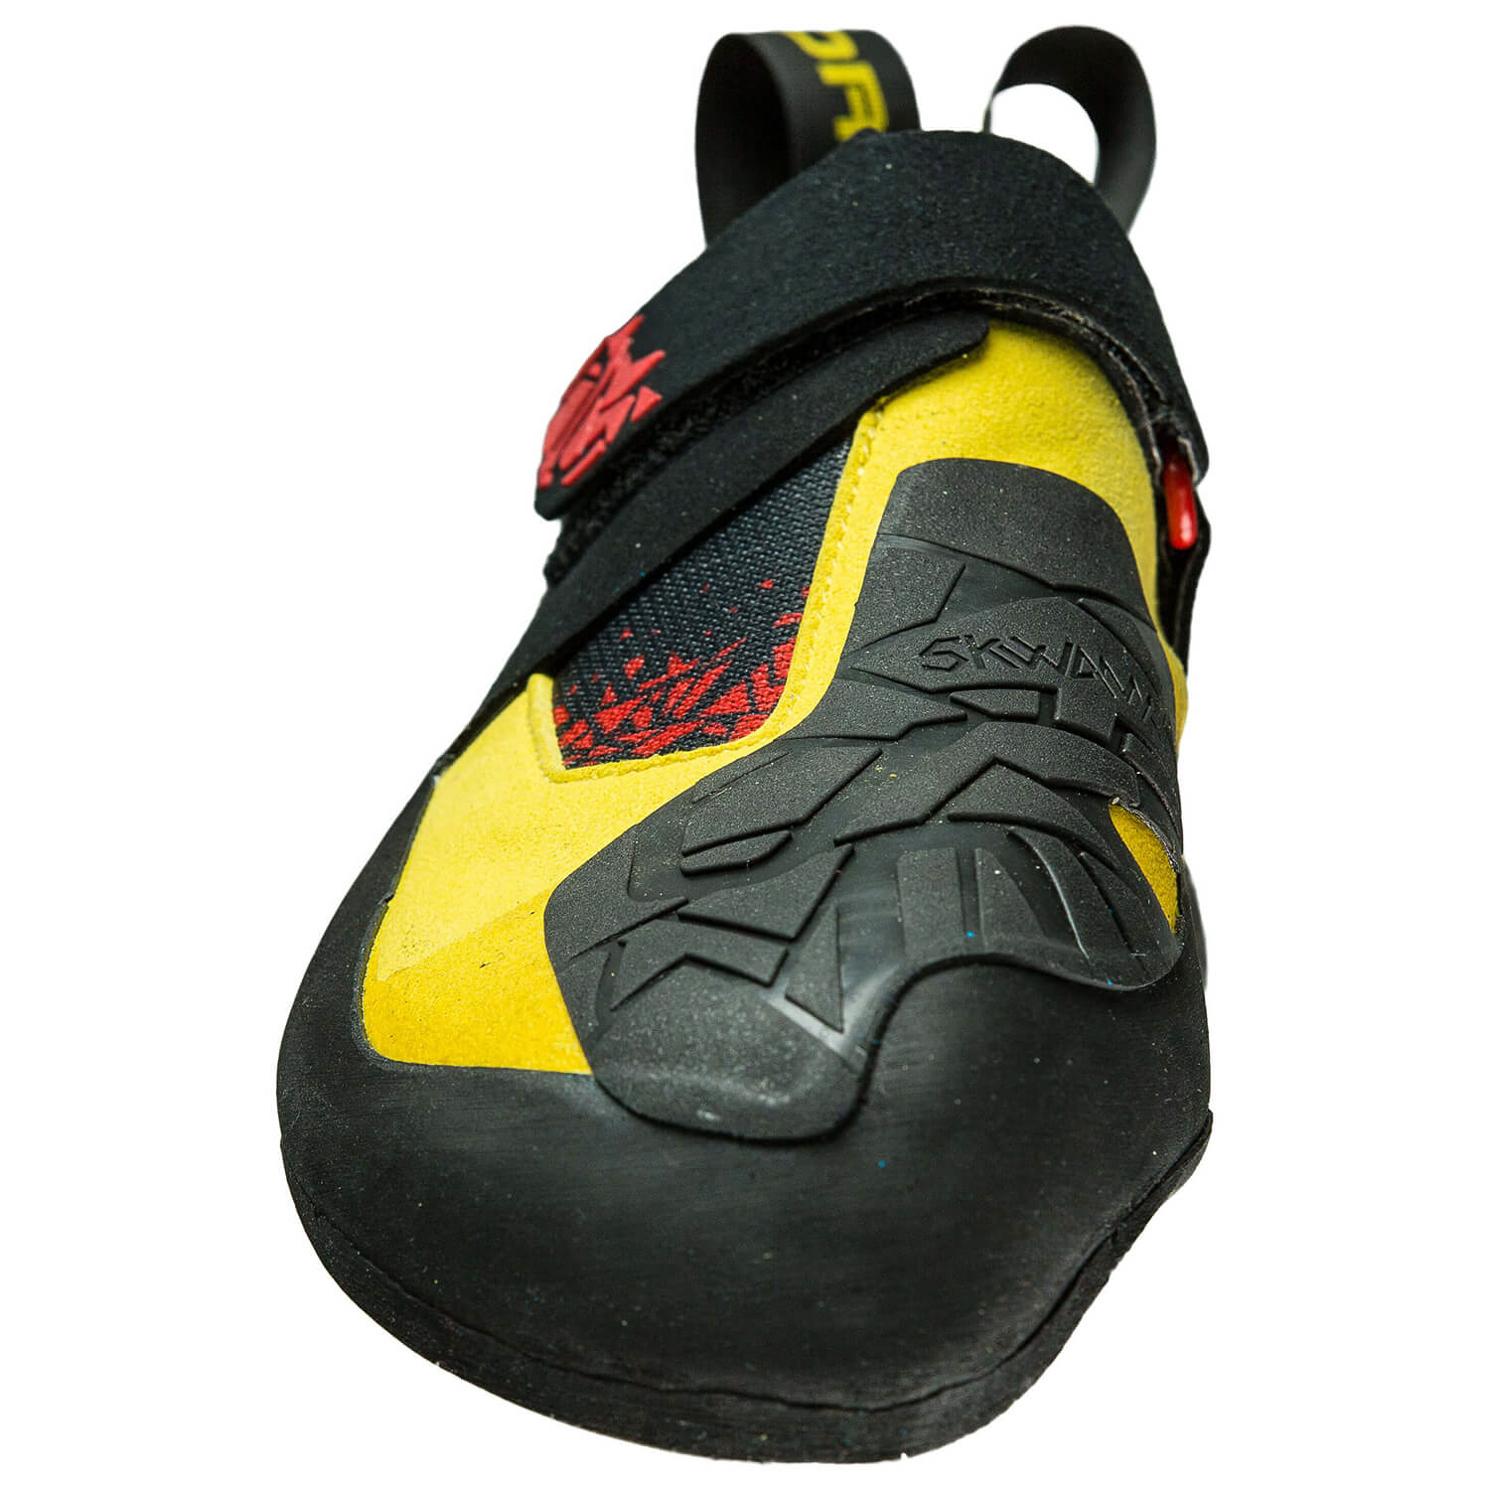 Sportiva Shoes Uk